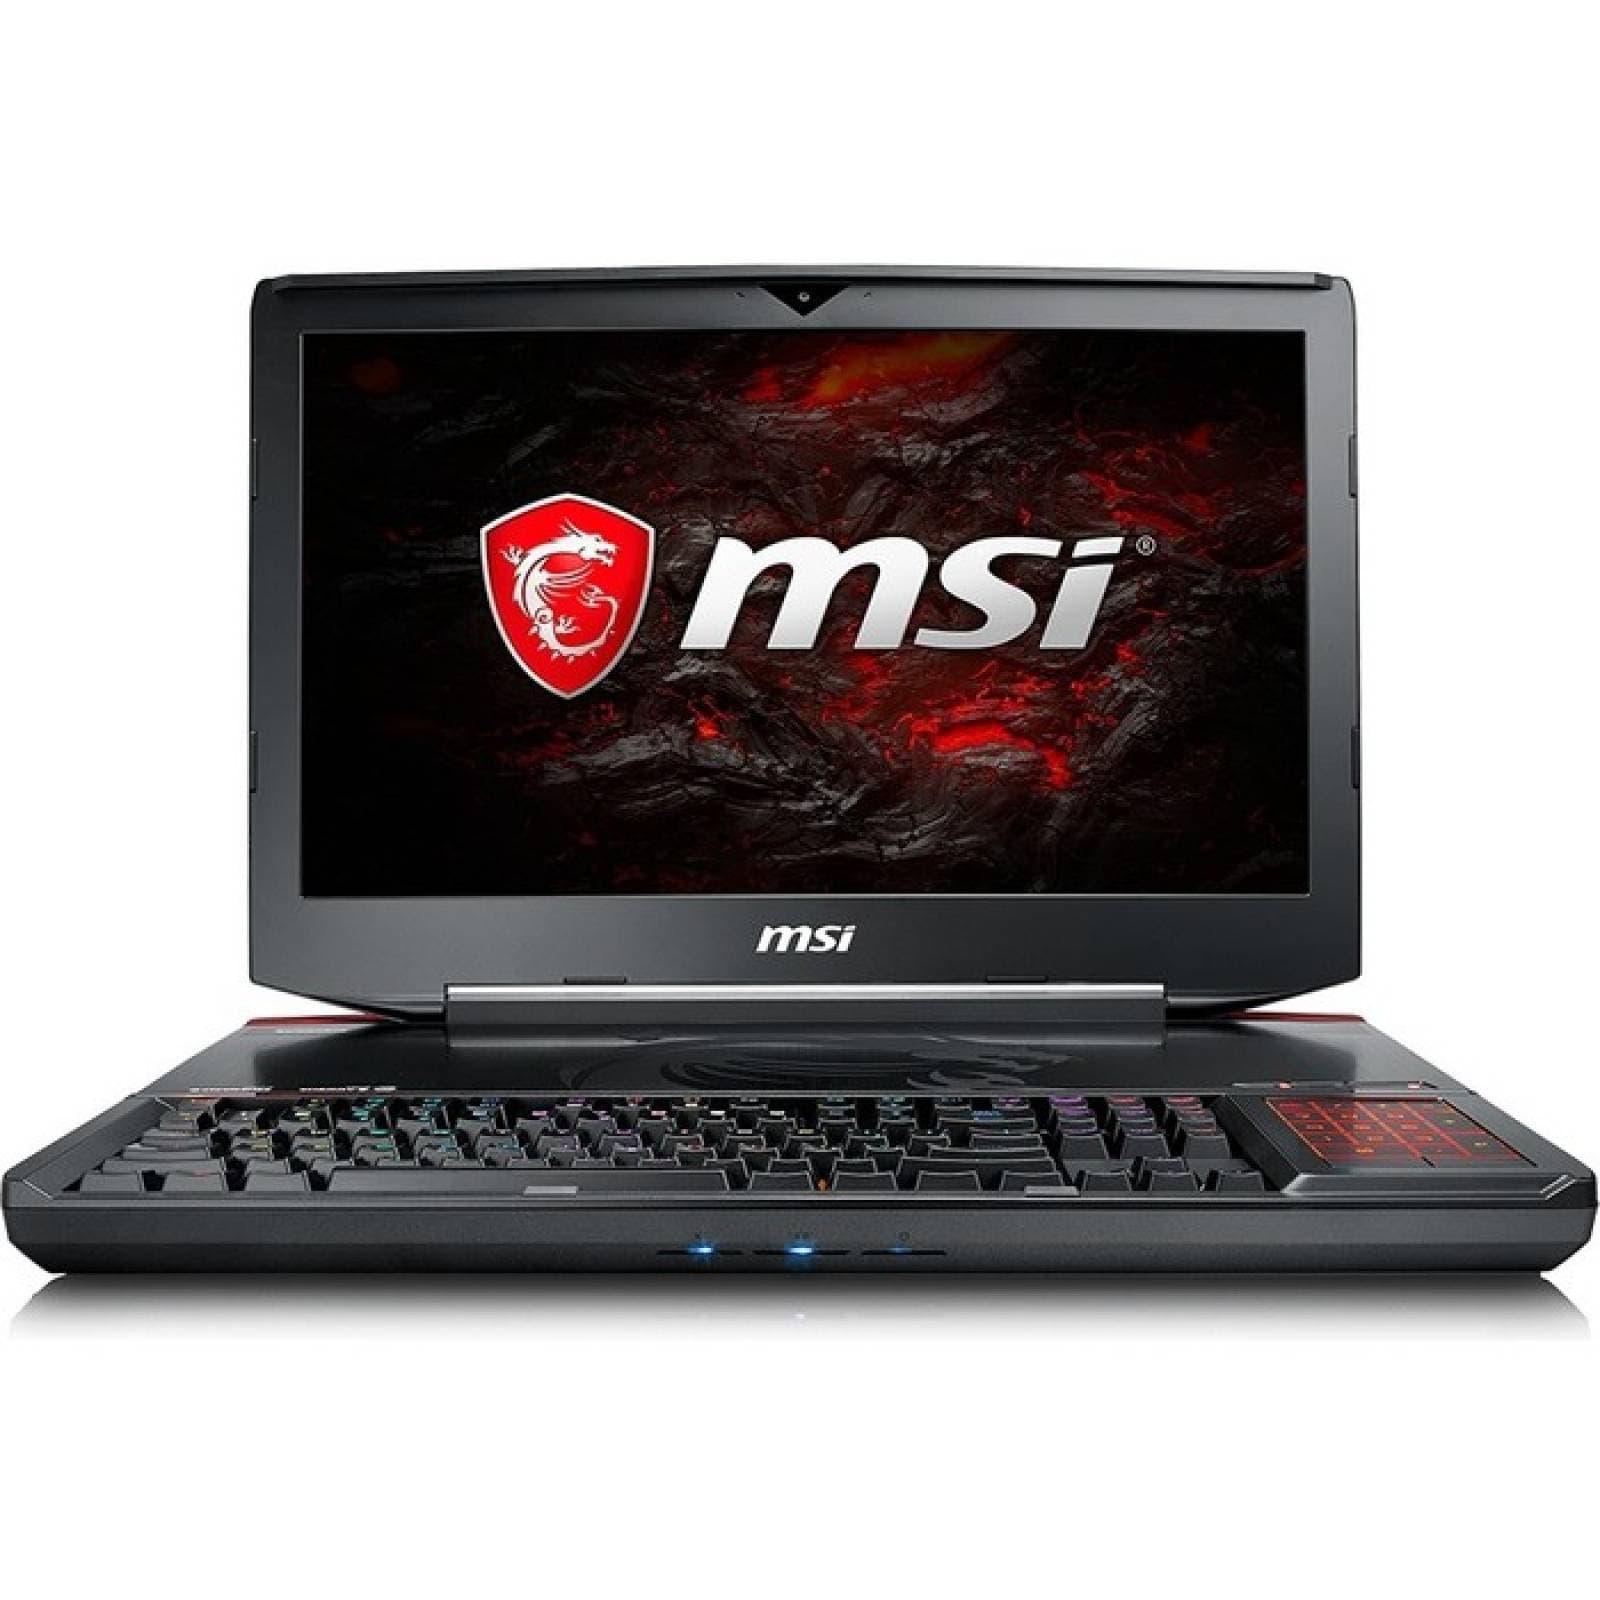 MSI GT83 Titan014 VR Ready Pantalla LCD para juegos de 184 quotcon pantalla LCD  Intel Core i7 (8a generacin) i78